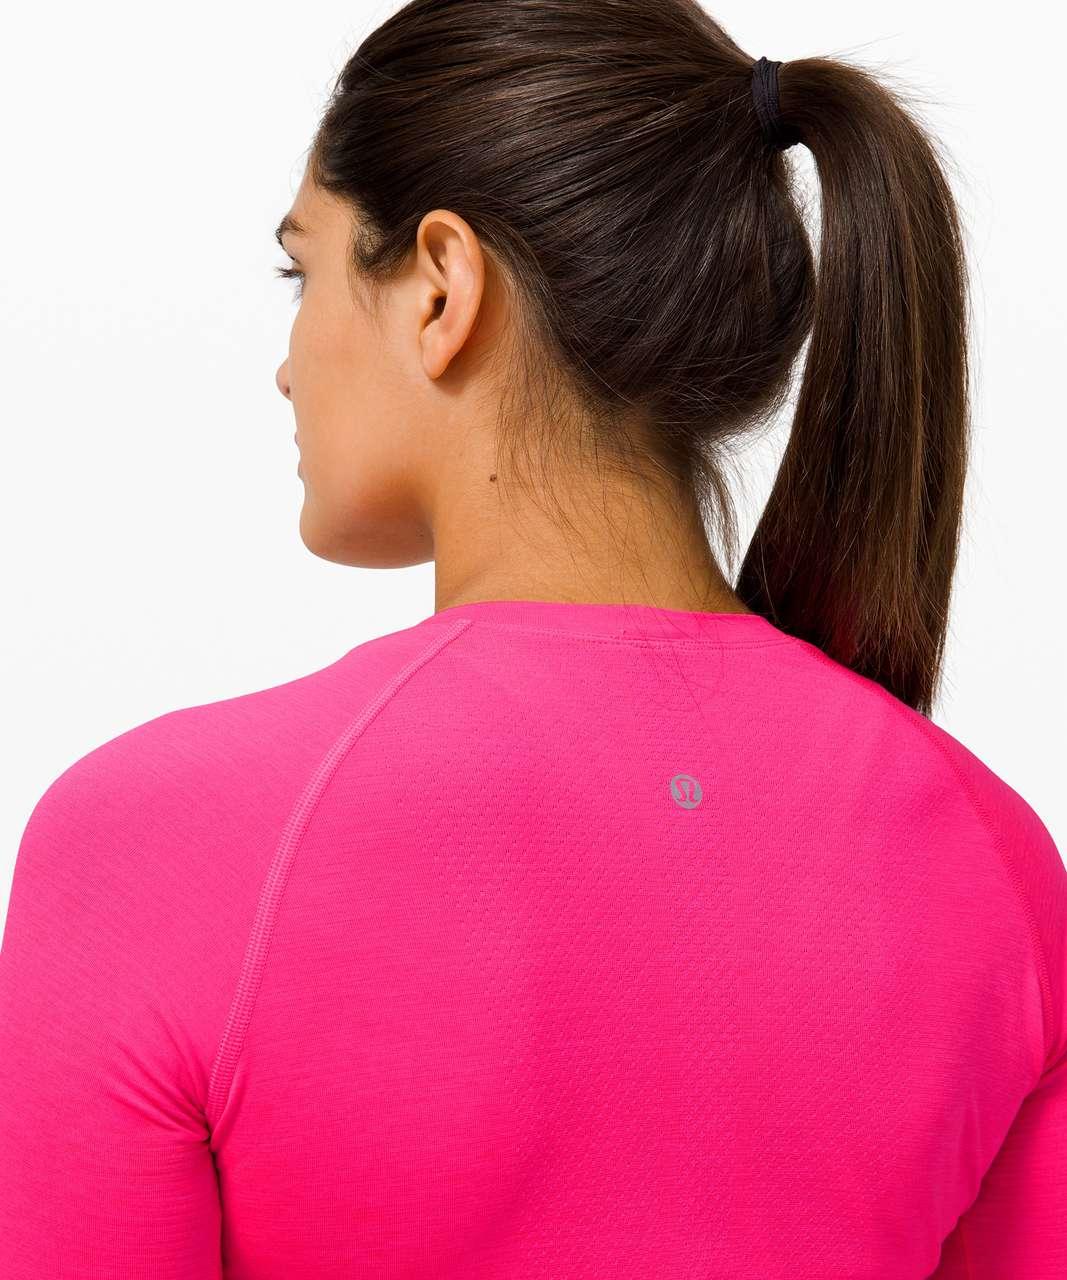 Lululemon Swiftly Tech Long Sleeve 2.0 *Race Length - Highlight Pink / Highlight Pink